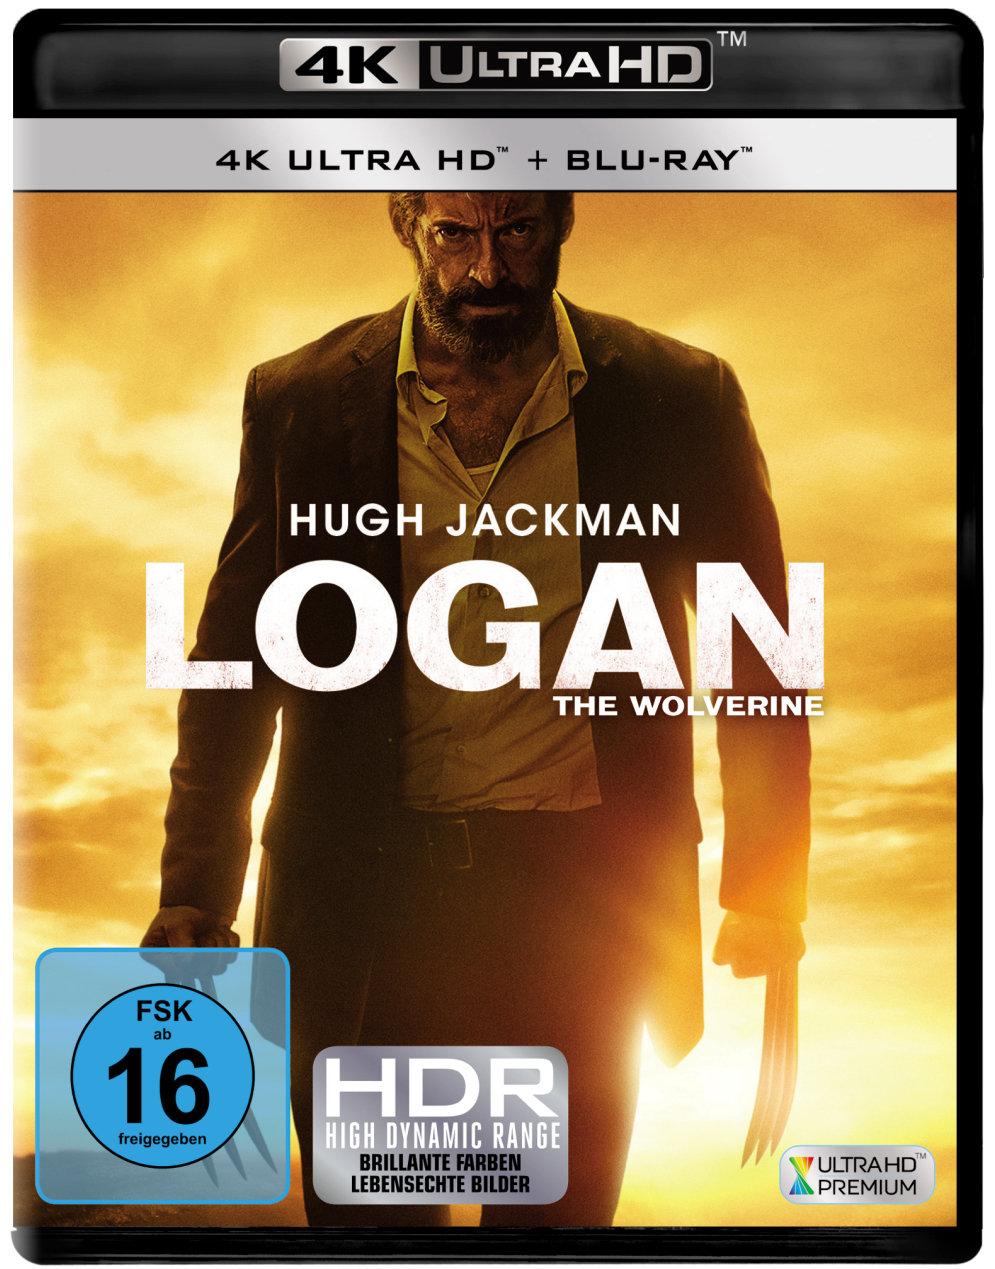 Logan 4K (2017) - The Wolverine (4K Ultra HD & Blu-ray)